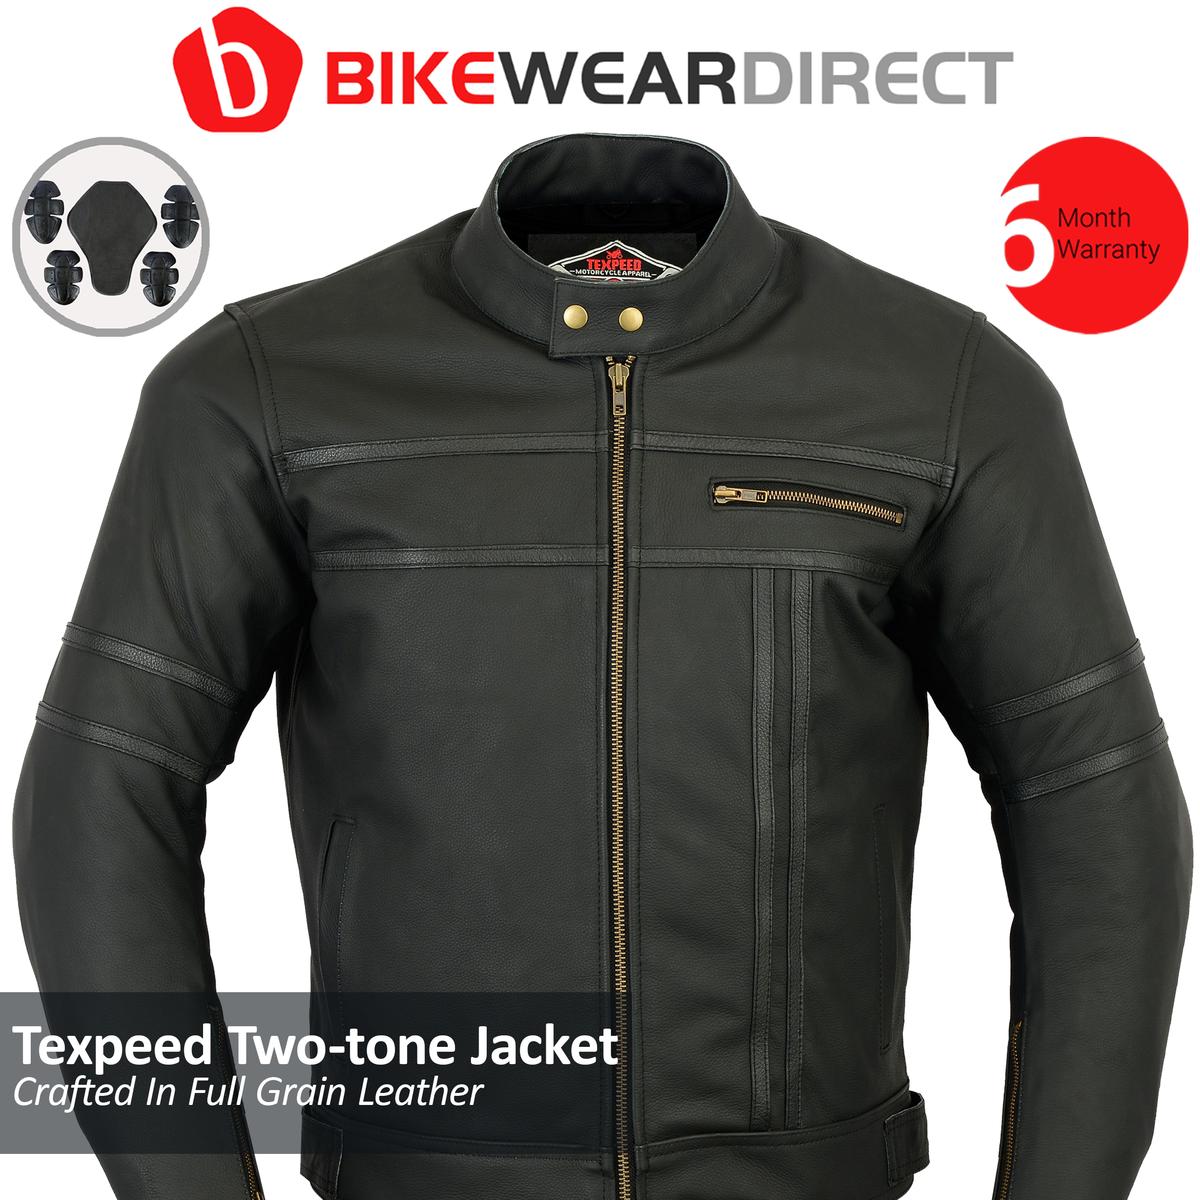 Texpeed Two Tone Leather Racing Jacket